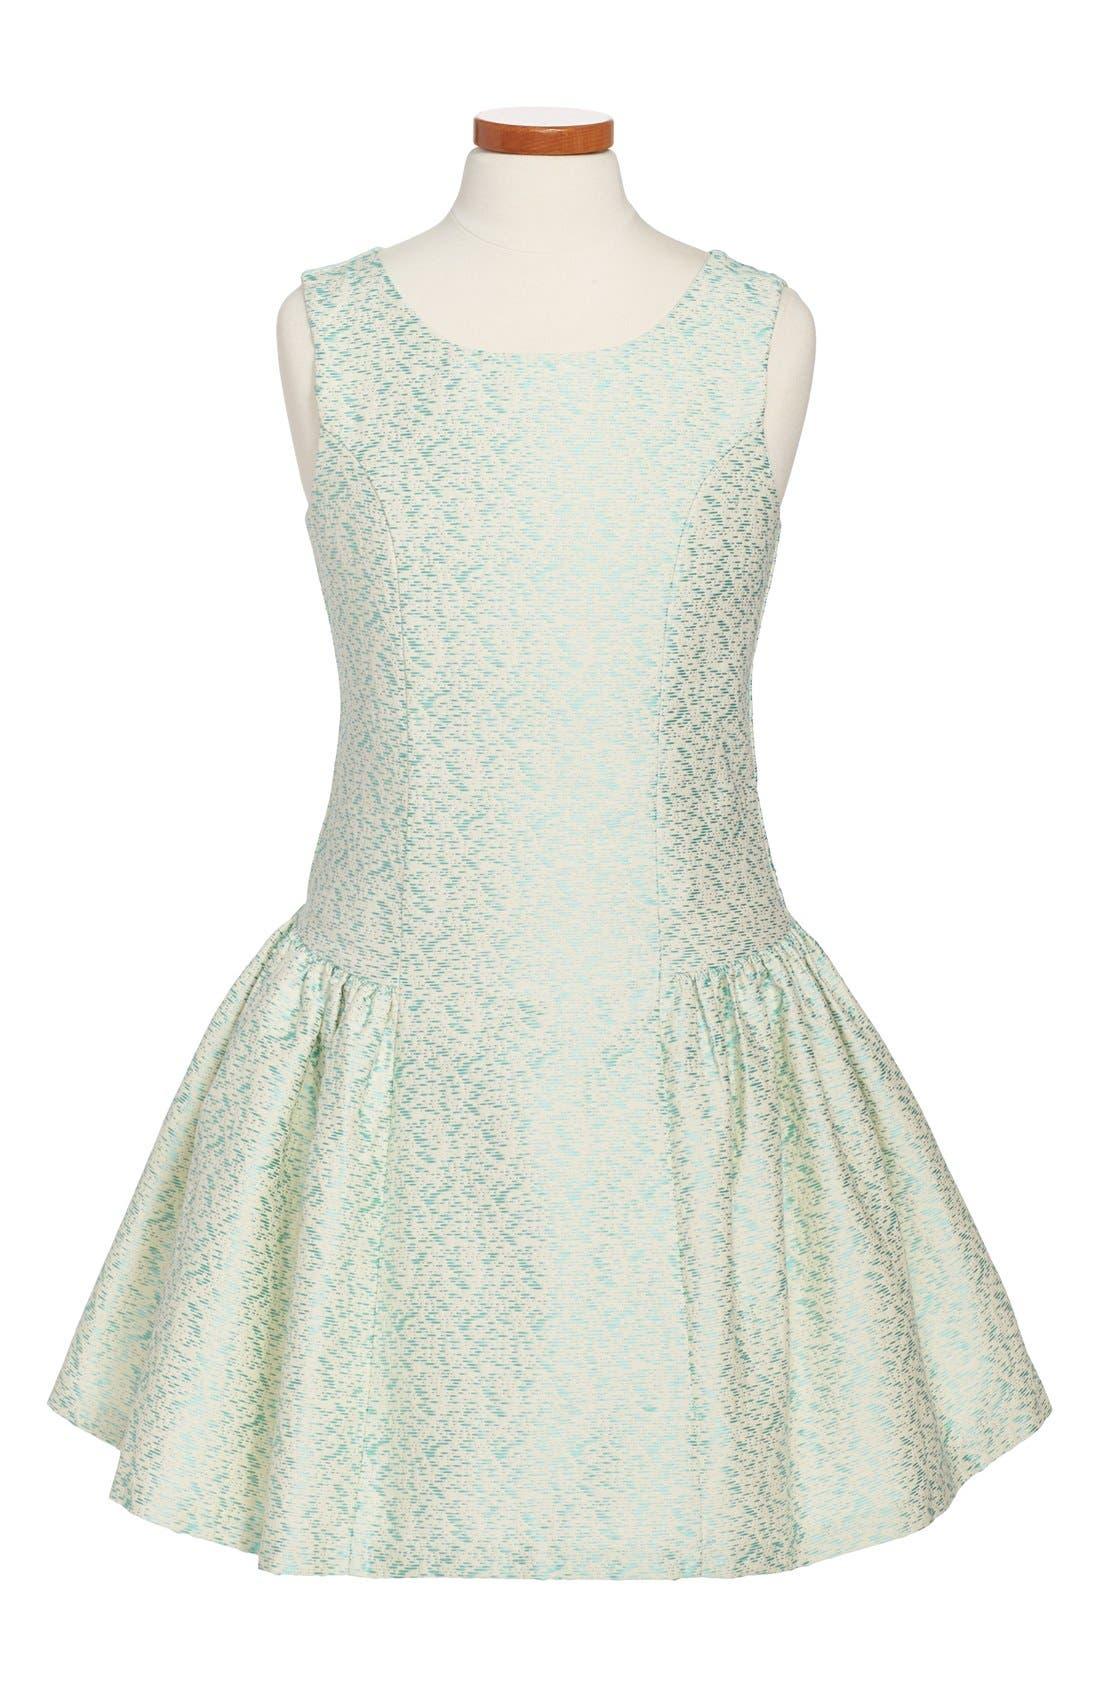 Alternate Image 1 Selected - Iris & Ivy Sleeveless Brocade Dress (Big Girls)